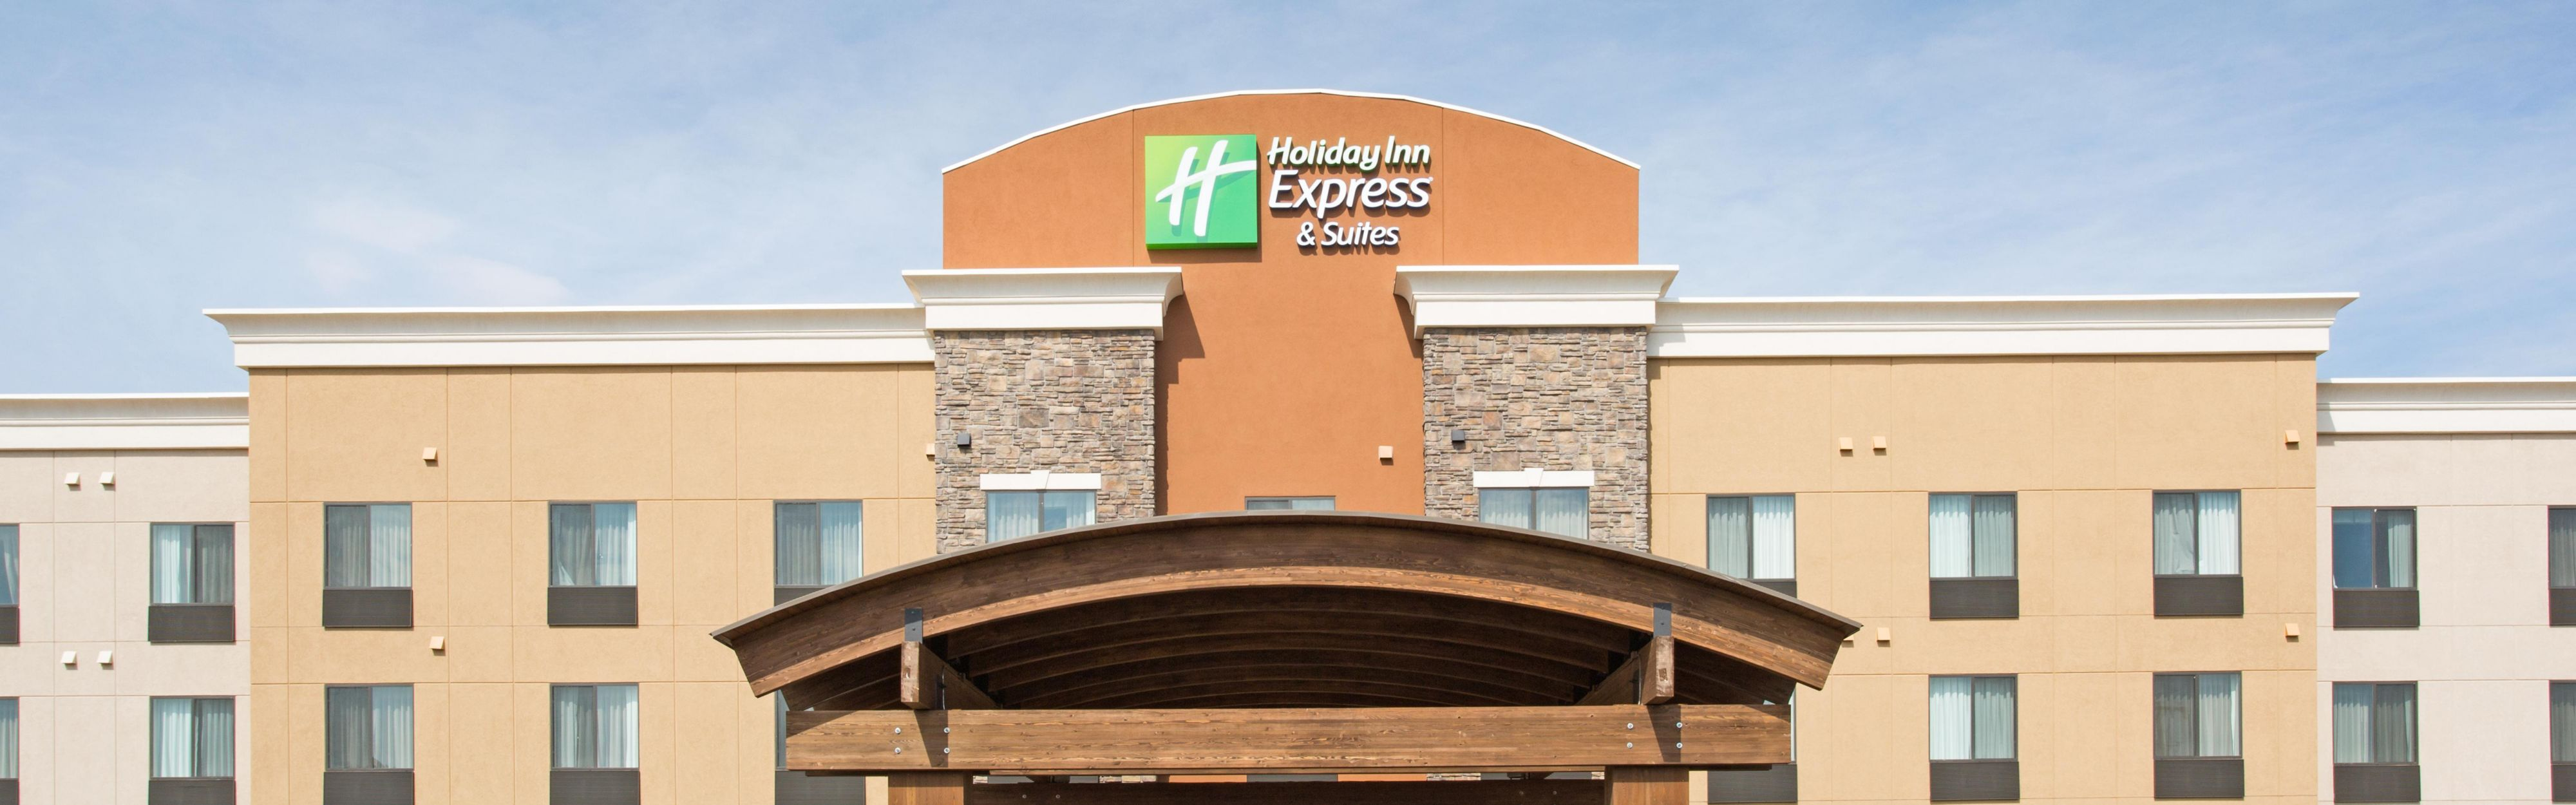 Holiday Inn Express & Suites Glendive image 0